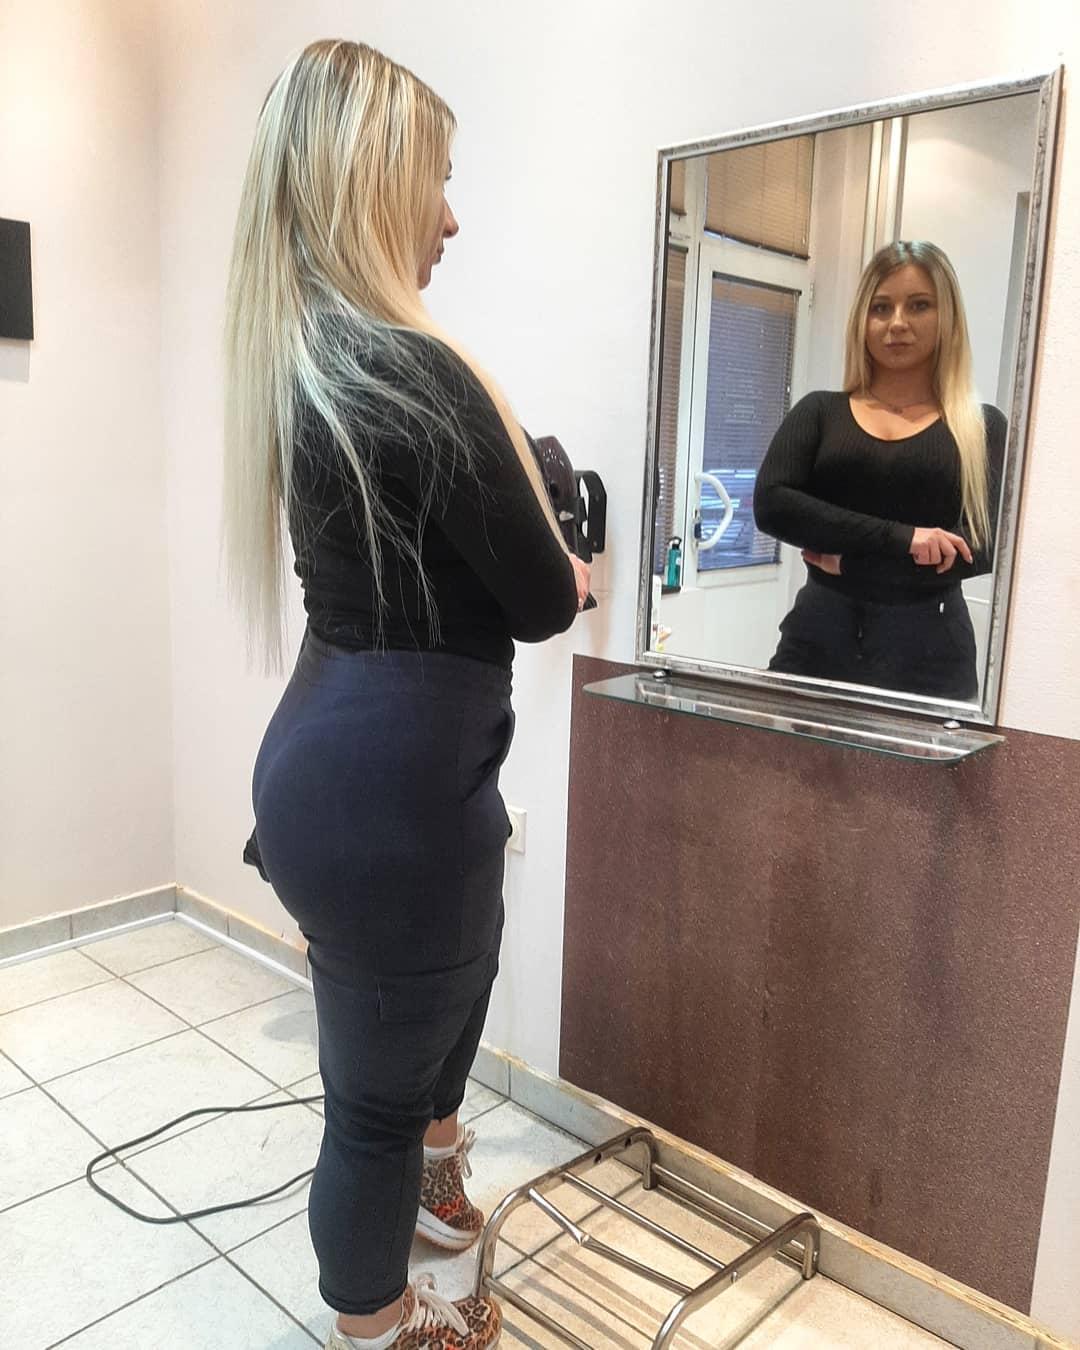 Kosana-Pavlovic-Wallpapers-Insta-Fit-Bio-4